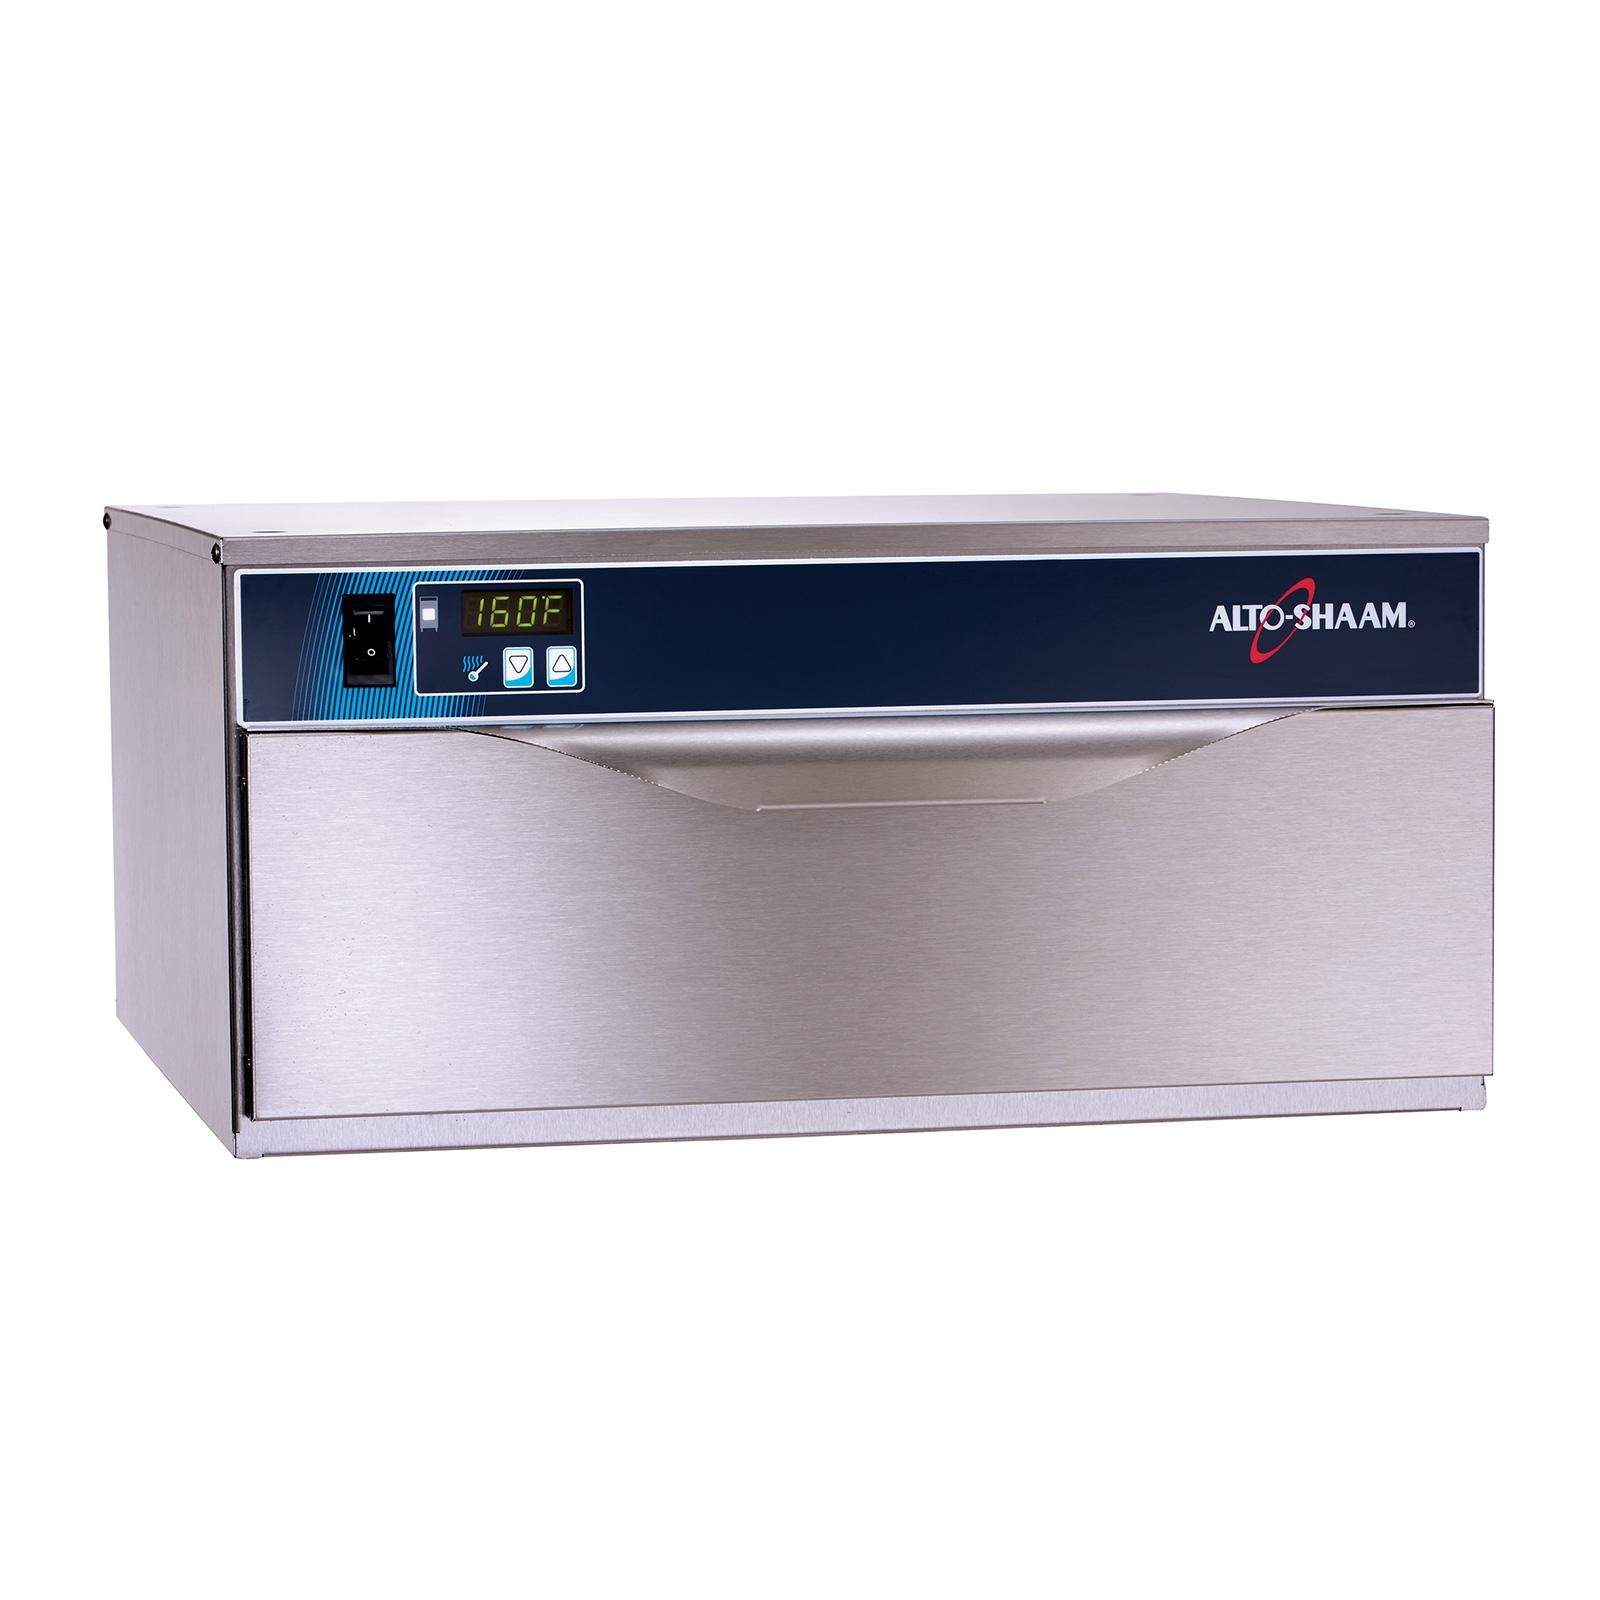 Alto-Shaam 500-1D-QS warming drawer, free standing